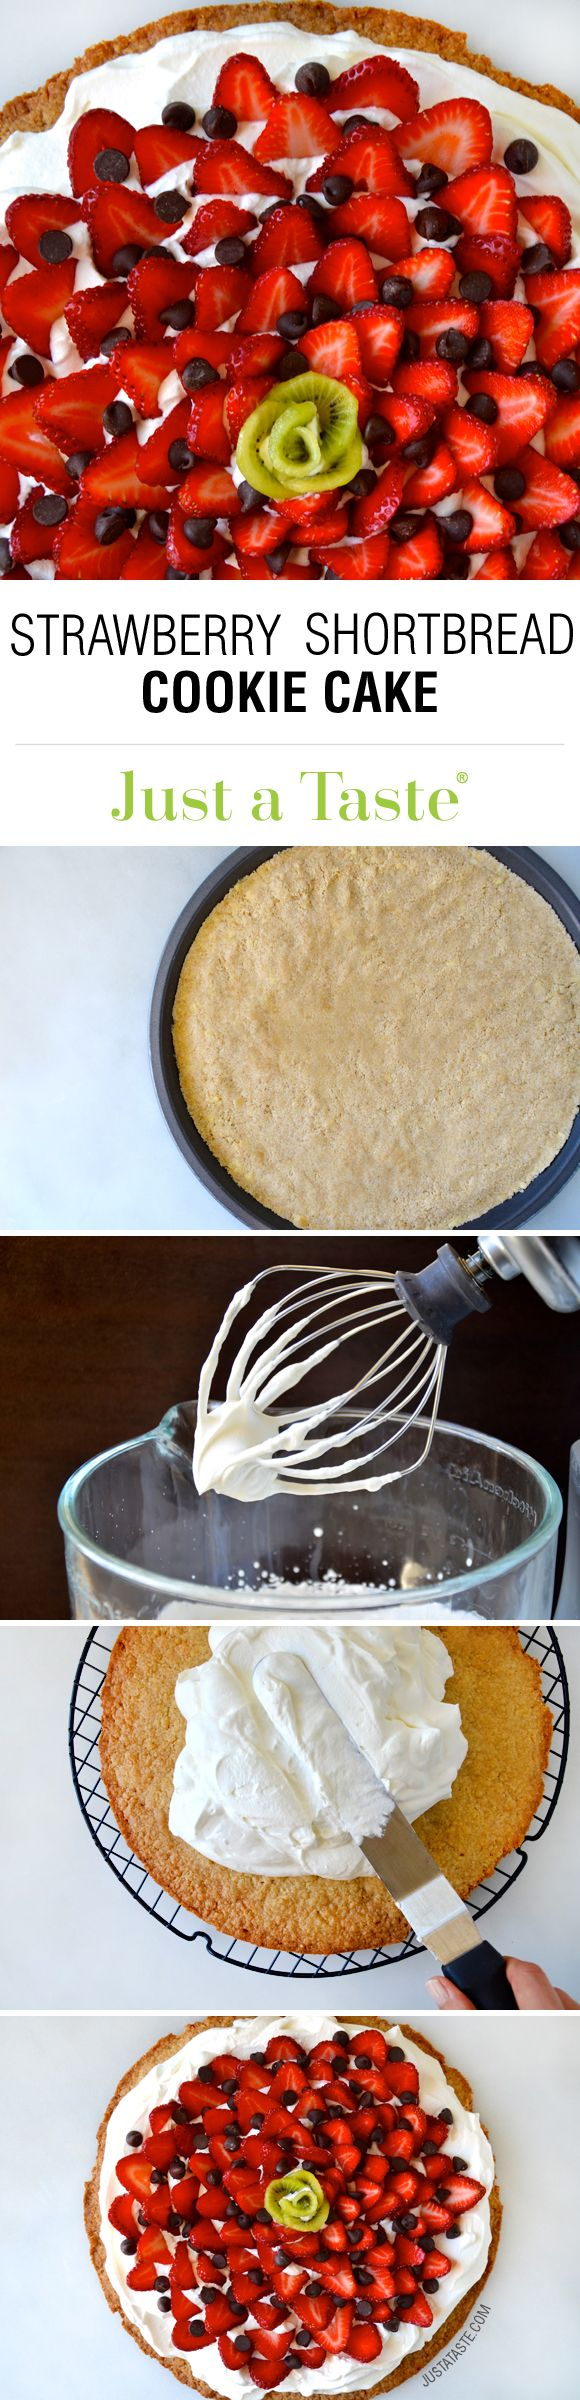 Strawberry Shortbread Cookie Cake #recipe on justataste.com